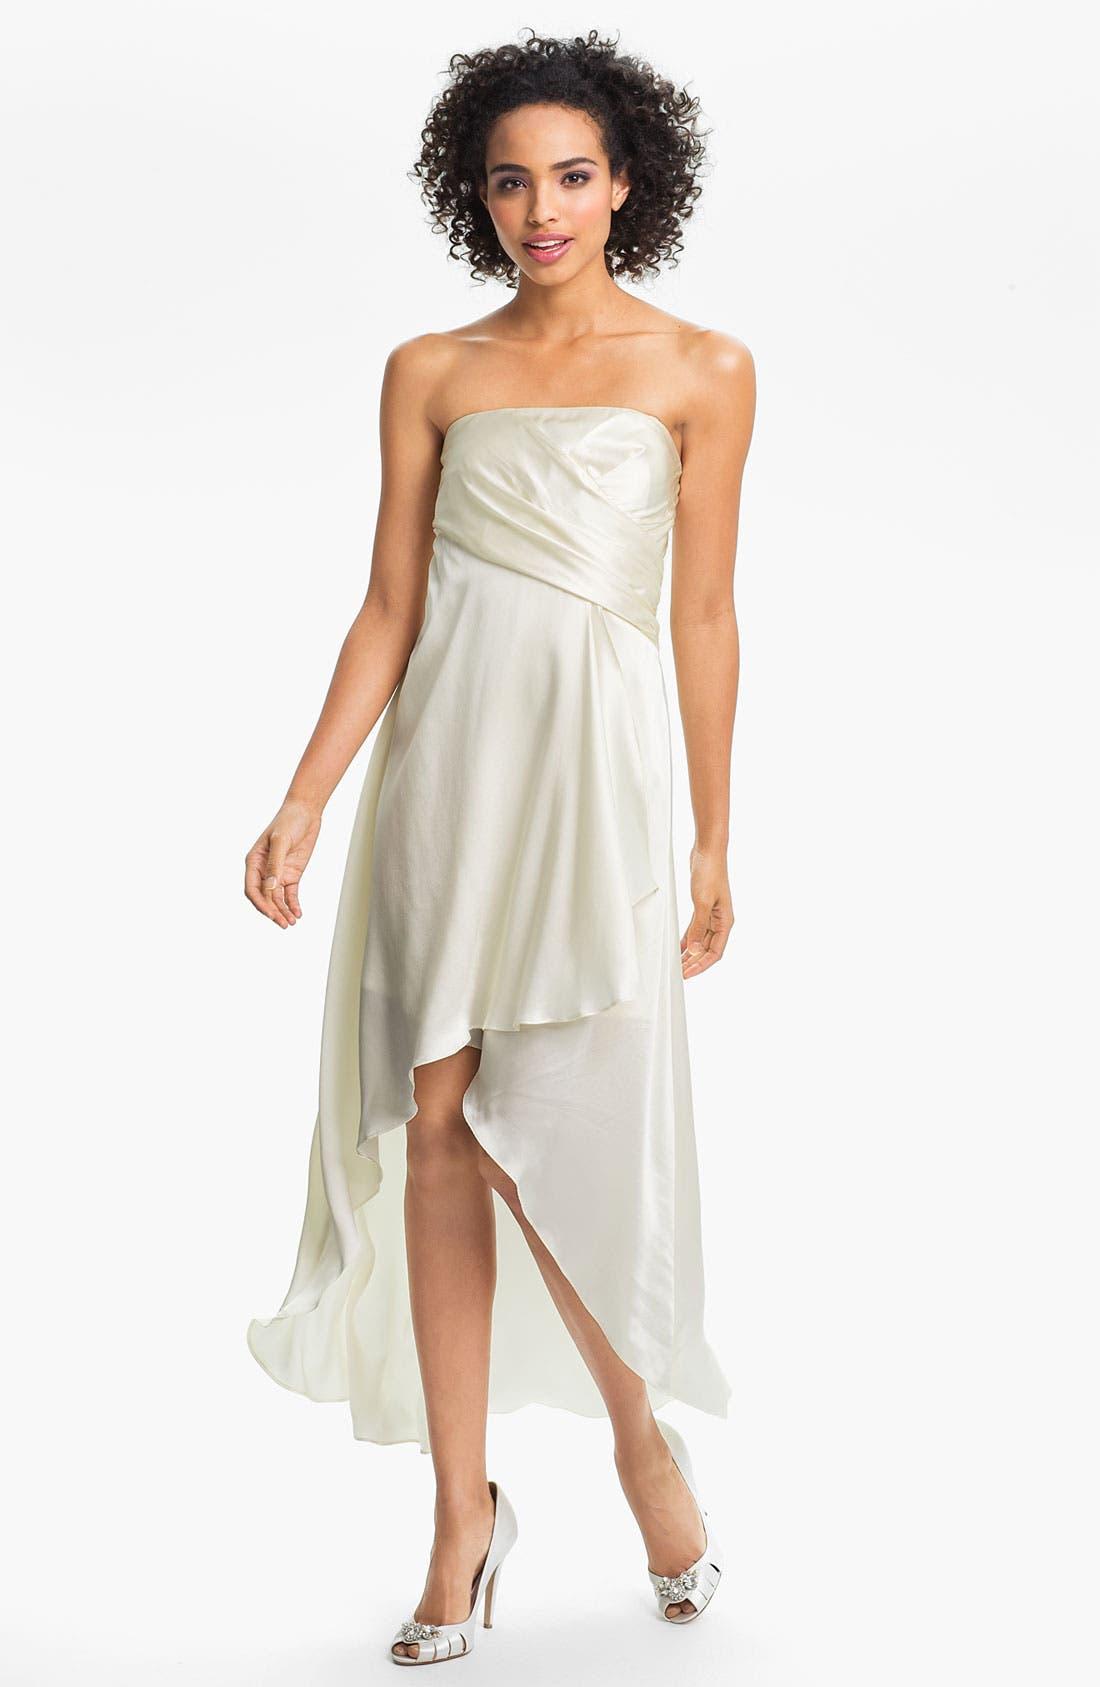 Main Image - Alexia Admor Strapless Silk Charmeuse Dress